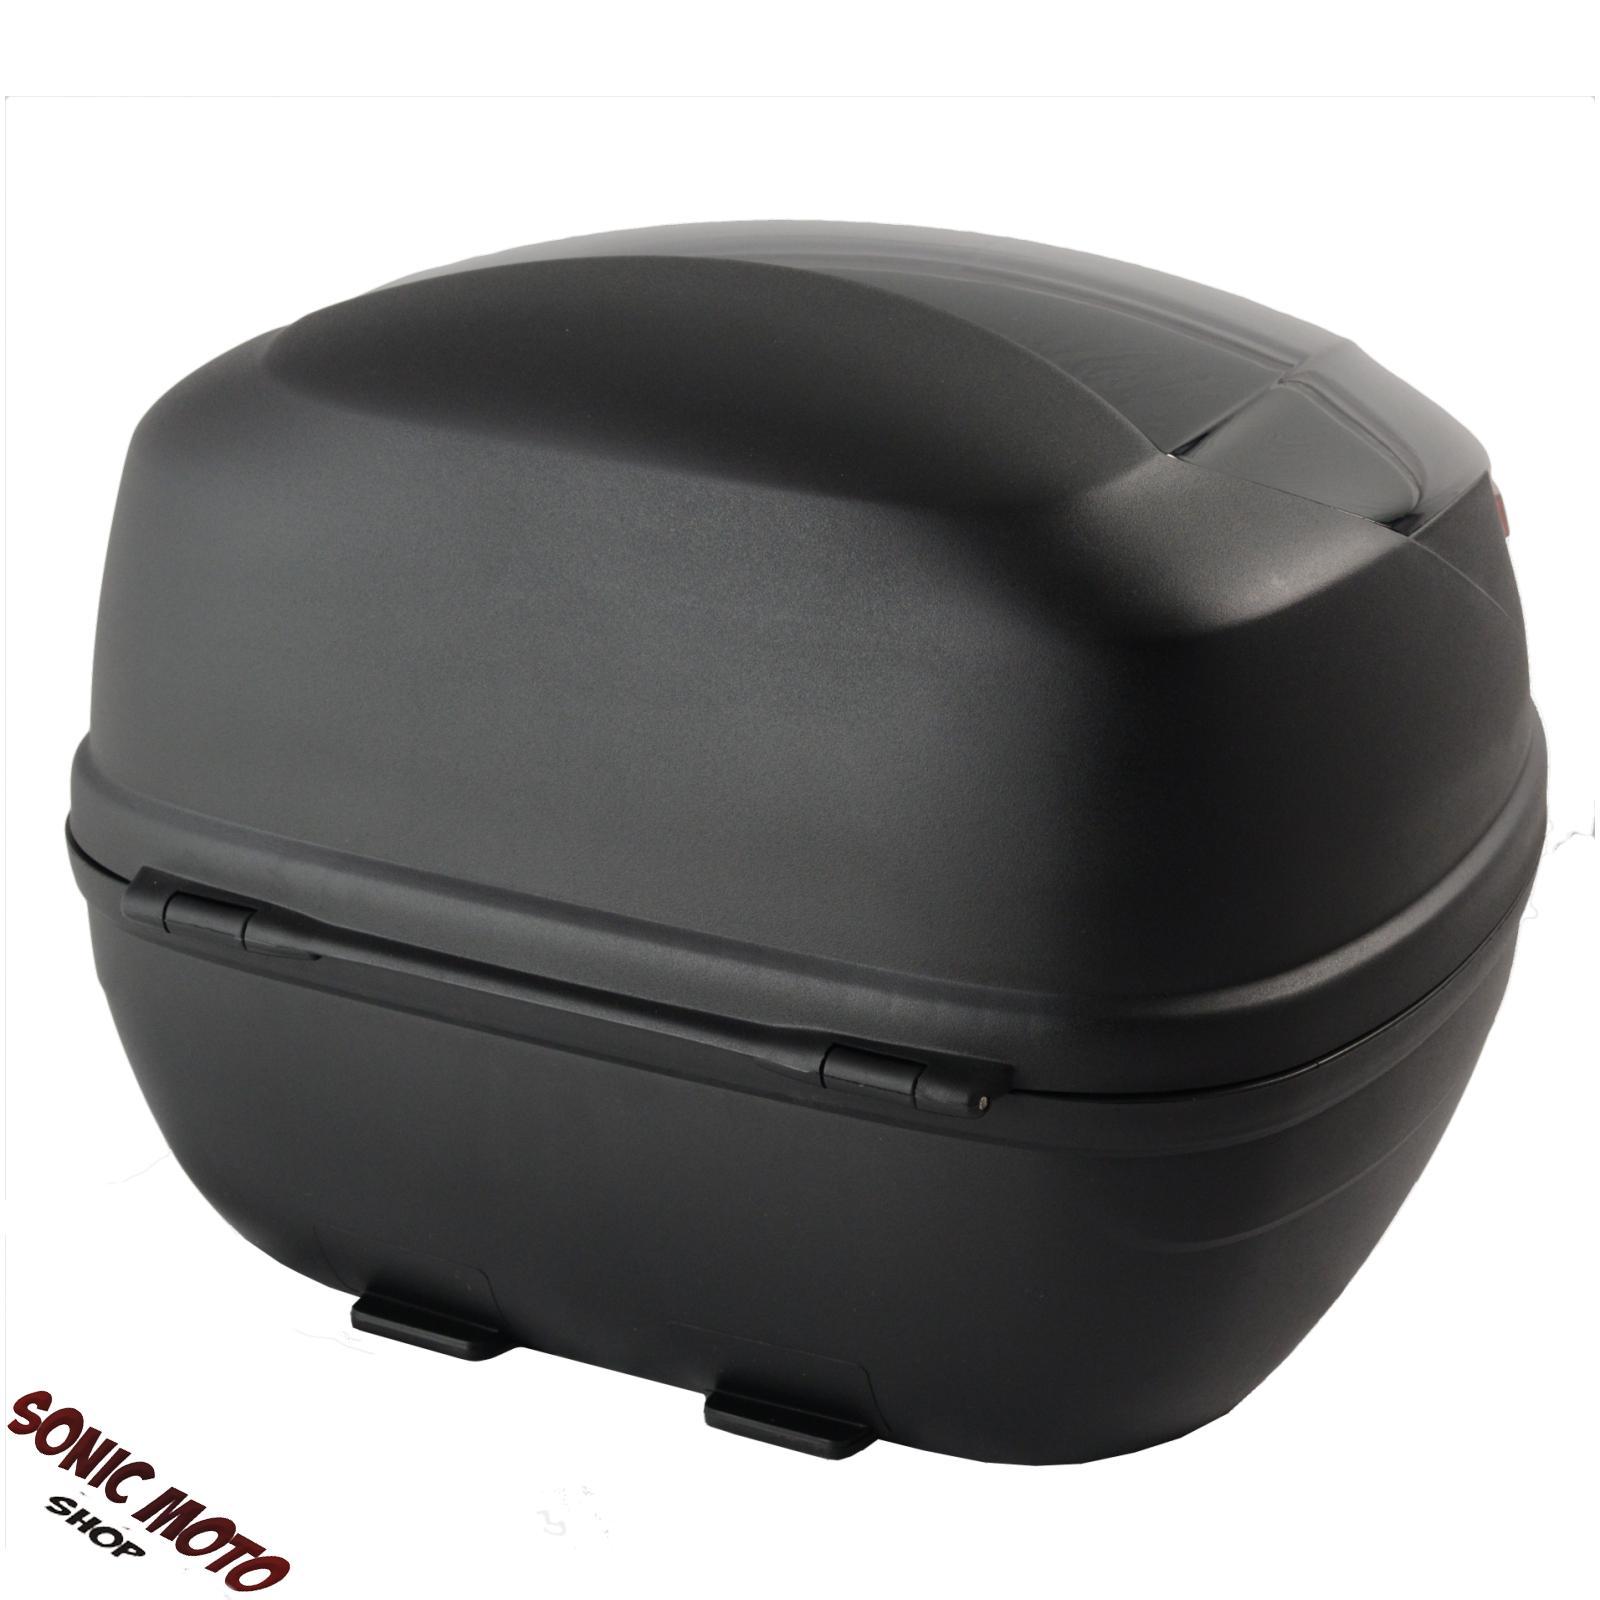 baul moto scooter top case baul 32 litros negro universal. Black Bedroom Furniture Sets. Home Design Ideas